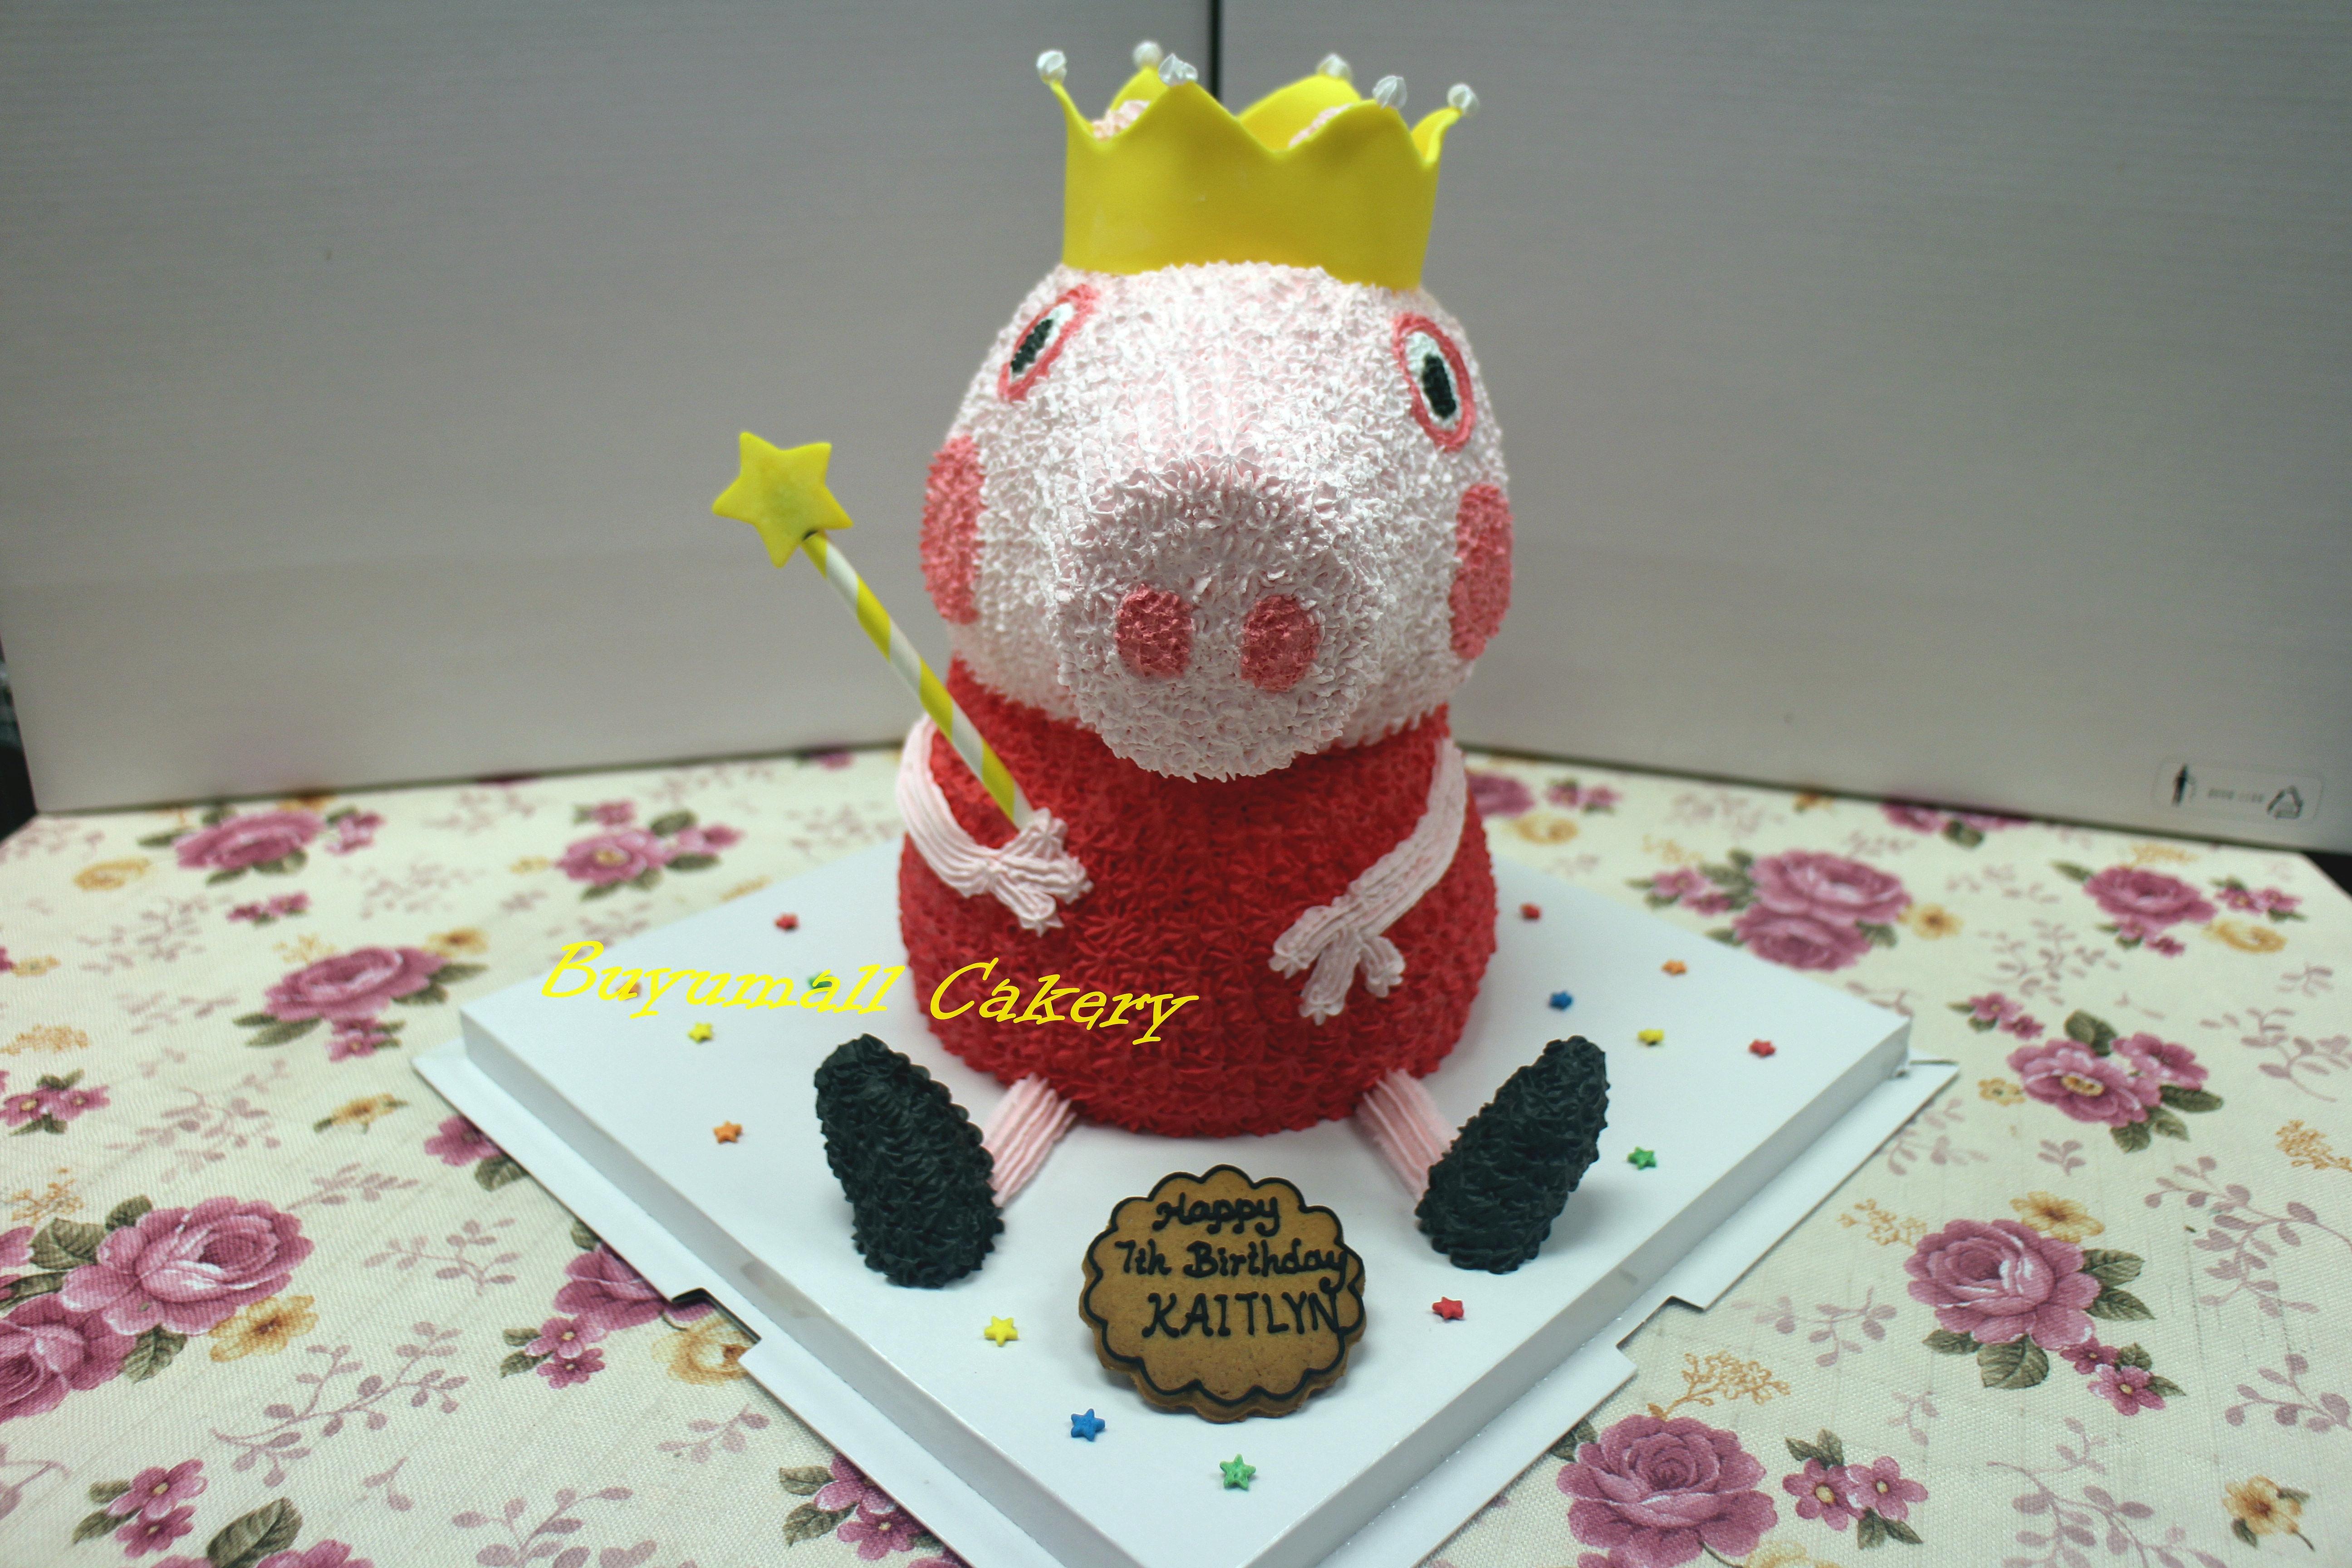 3D 立體 王冠 Peppa Pig 粉紅豬小妹 佩佩豬